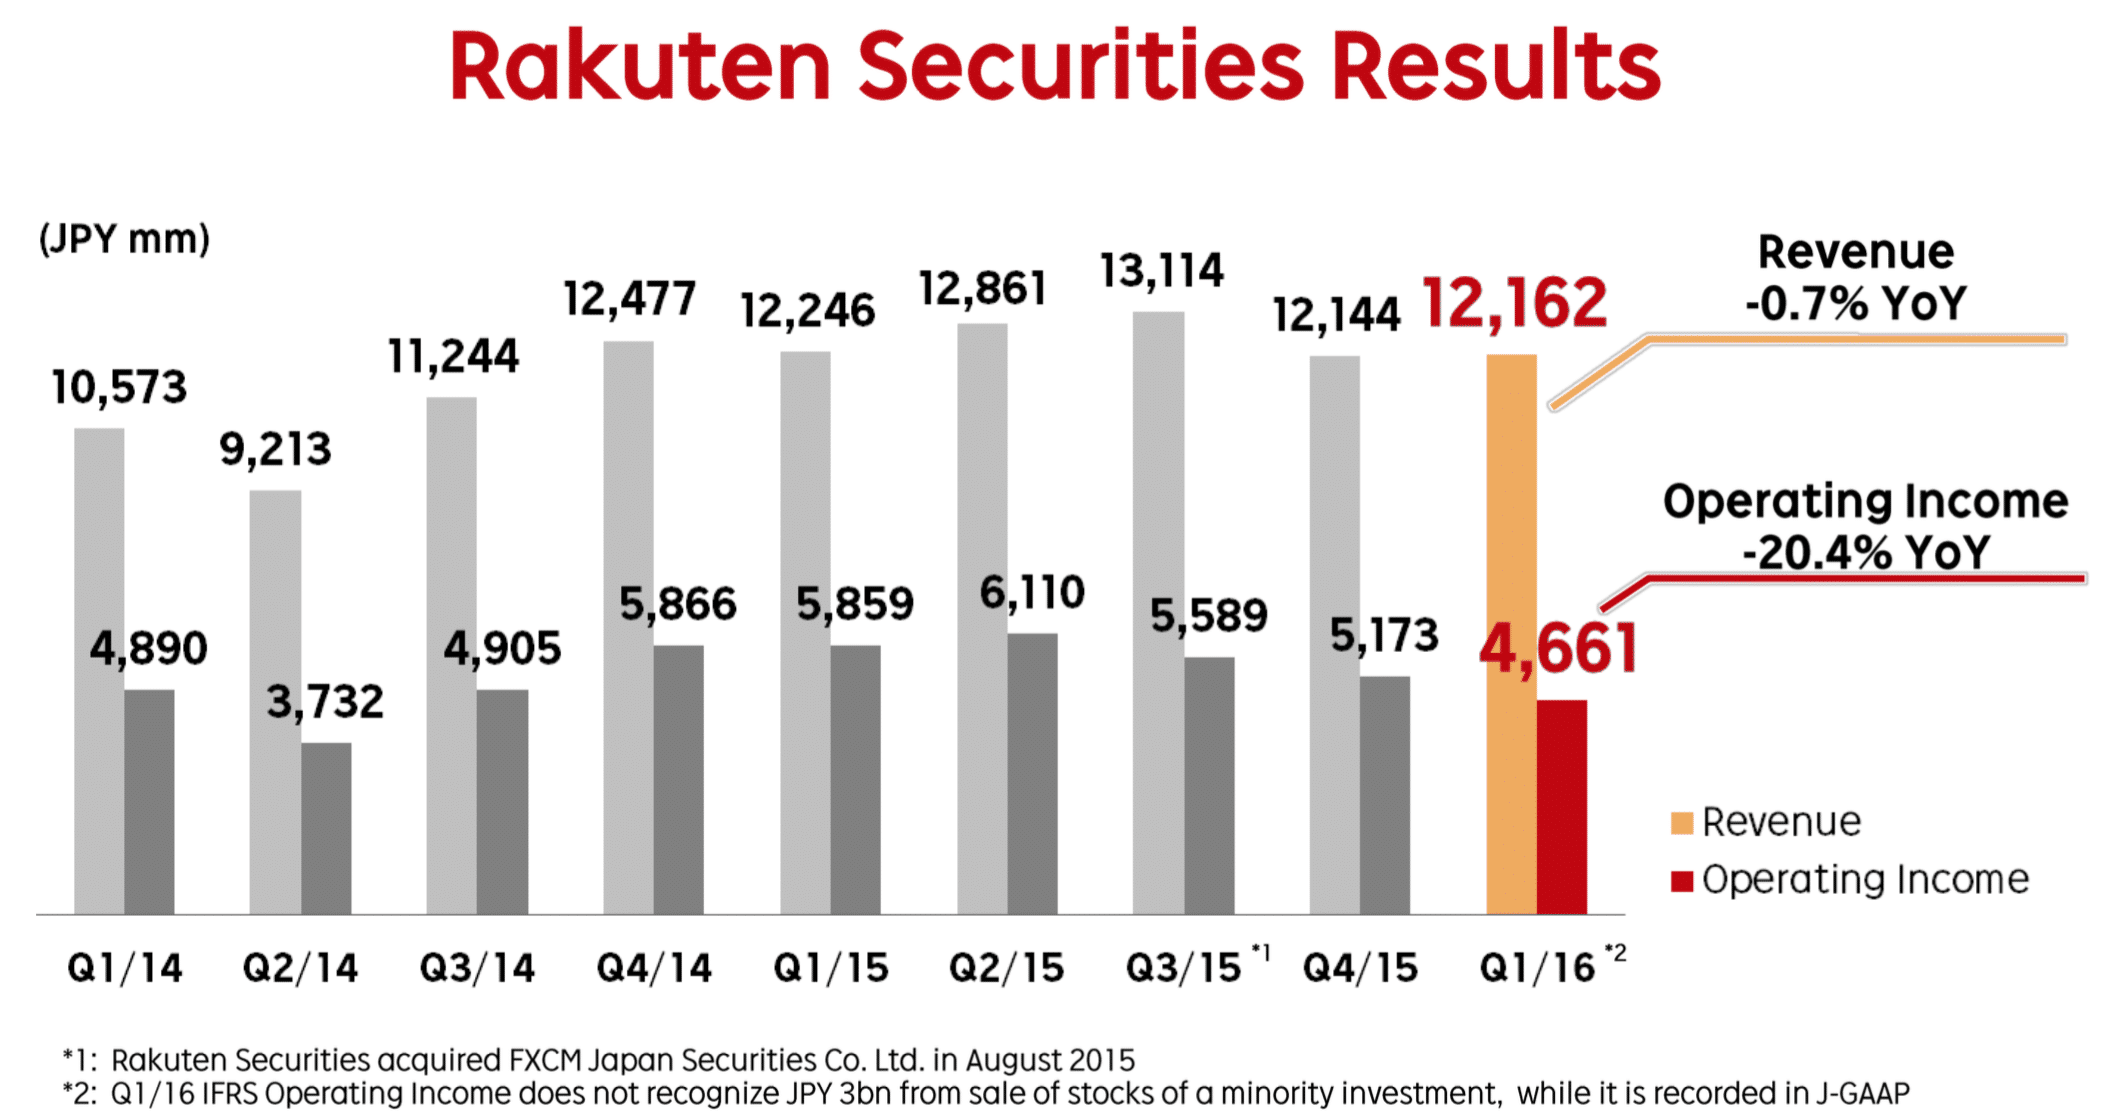 Source: Rakuten Q1 2016 Financials presentation